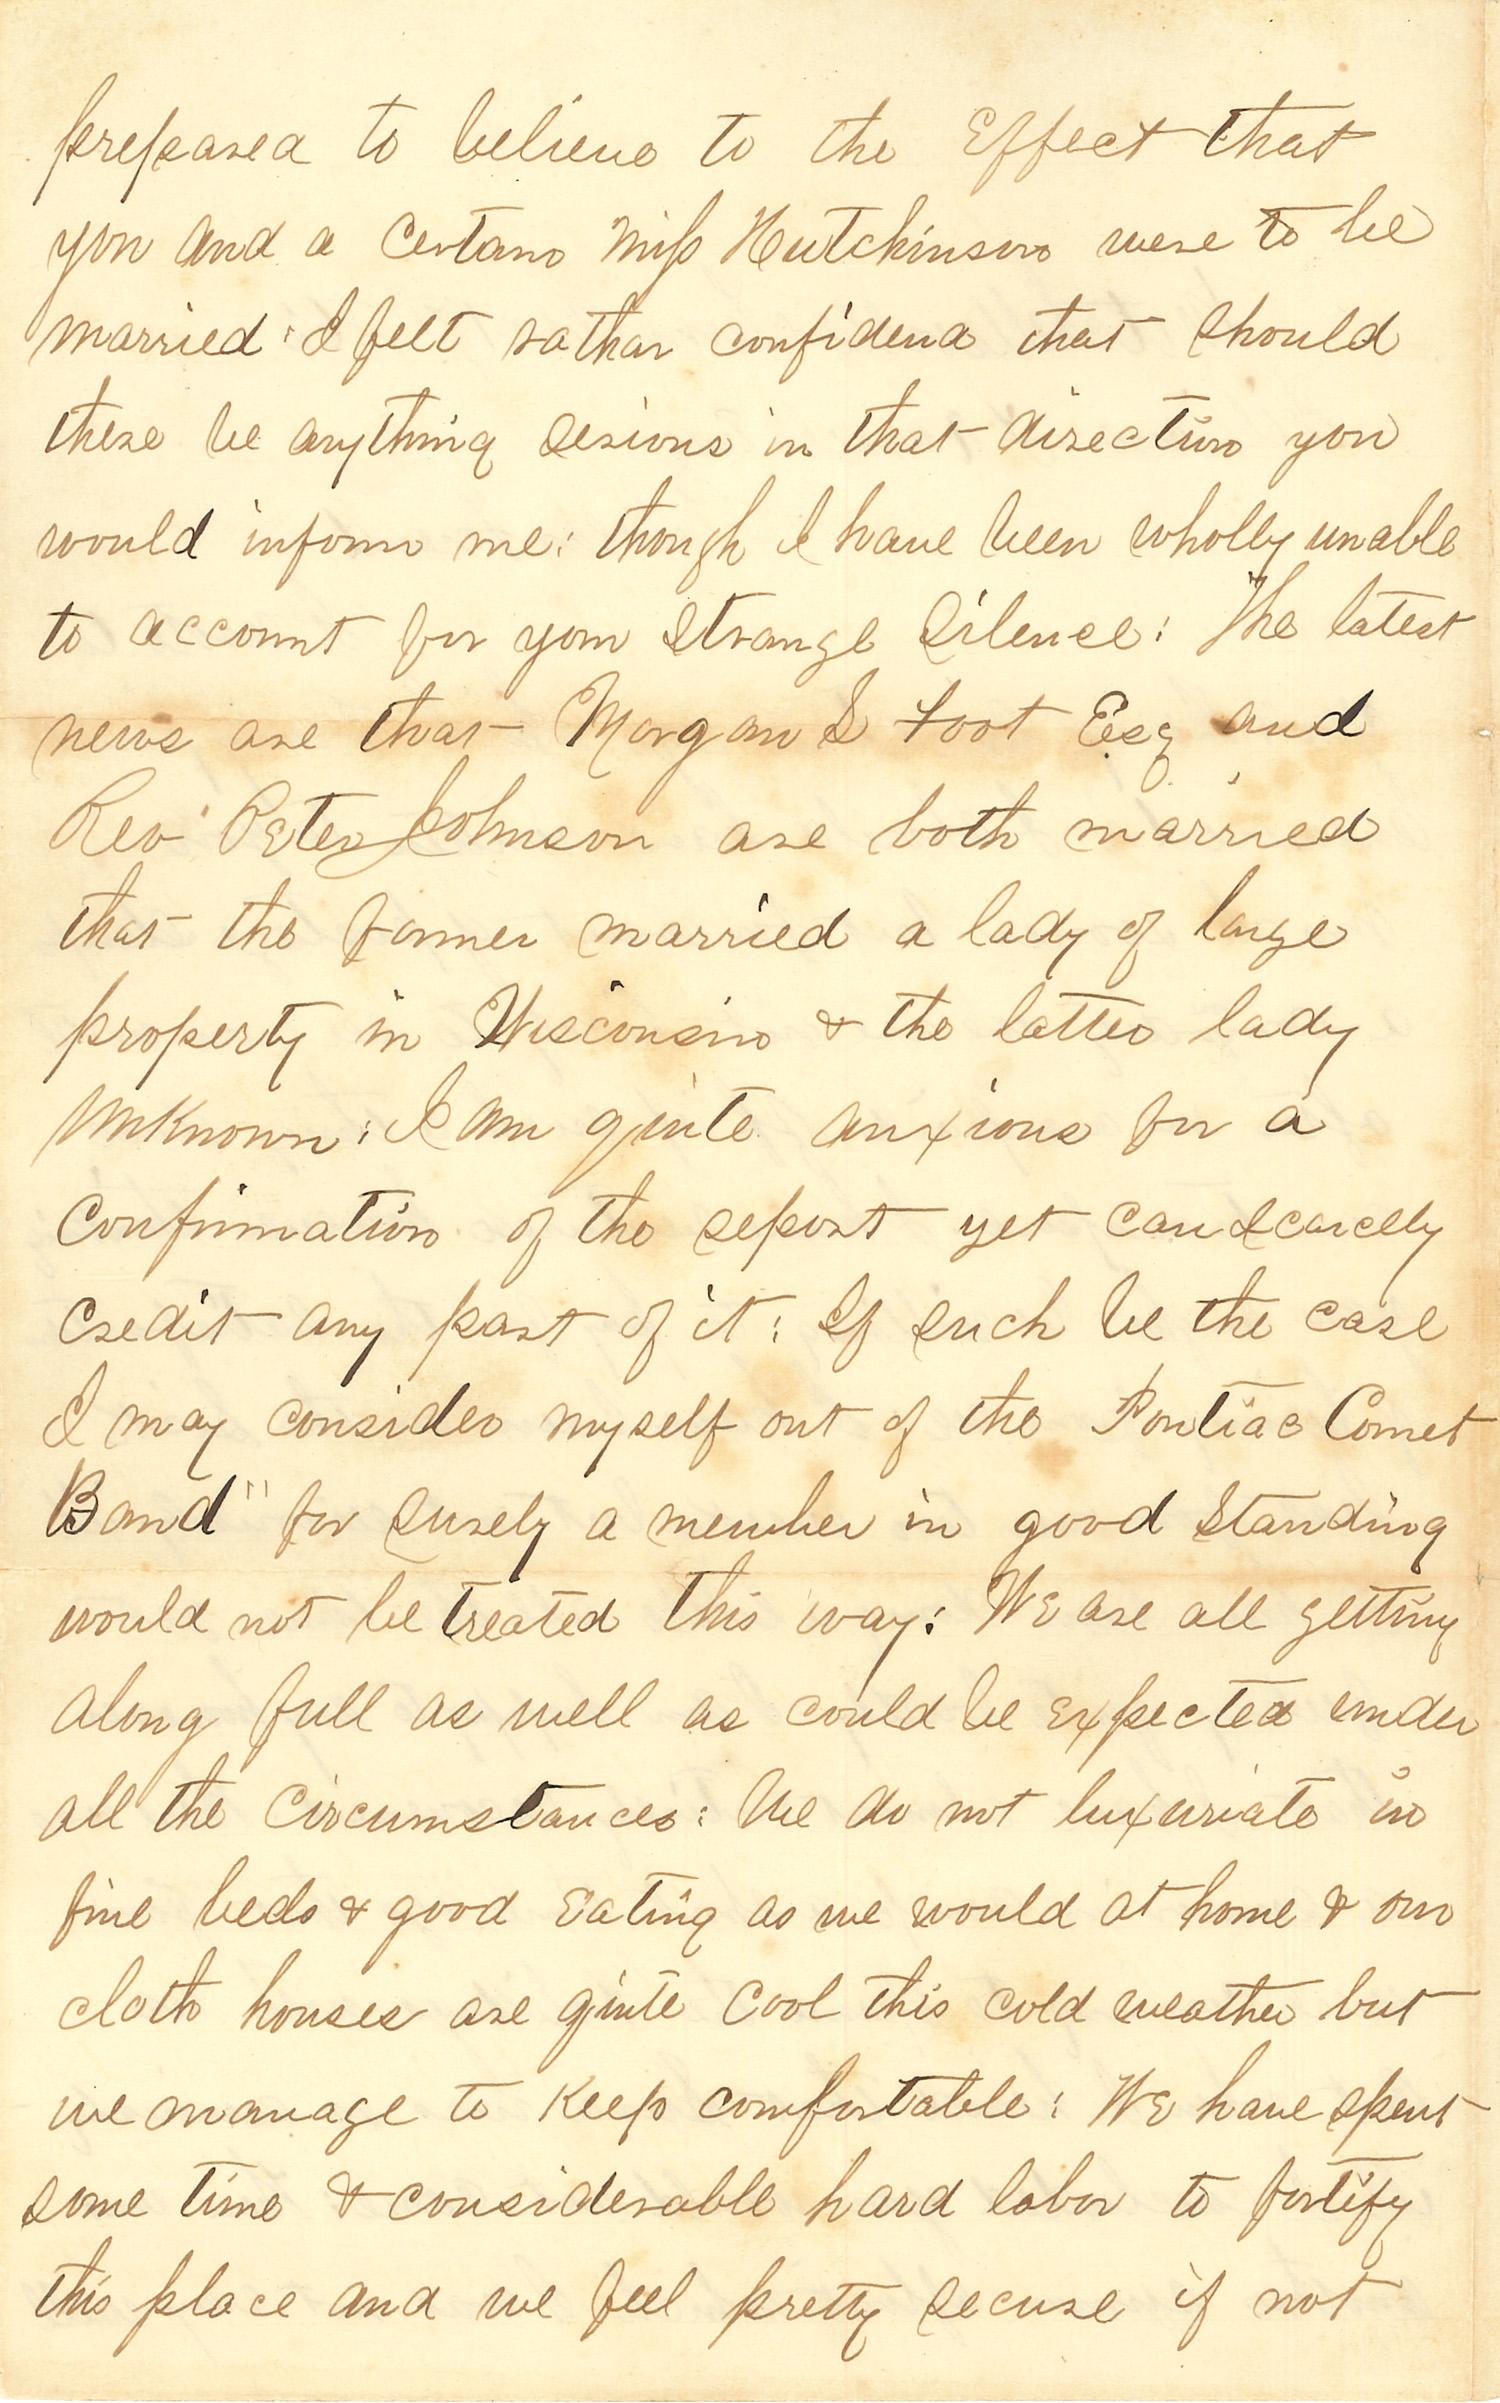 Joseph Culver Letter, December 17, 1862, Page 2